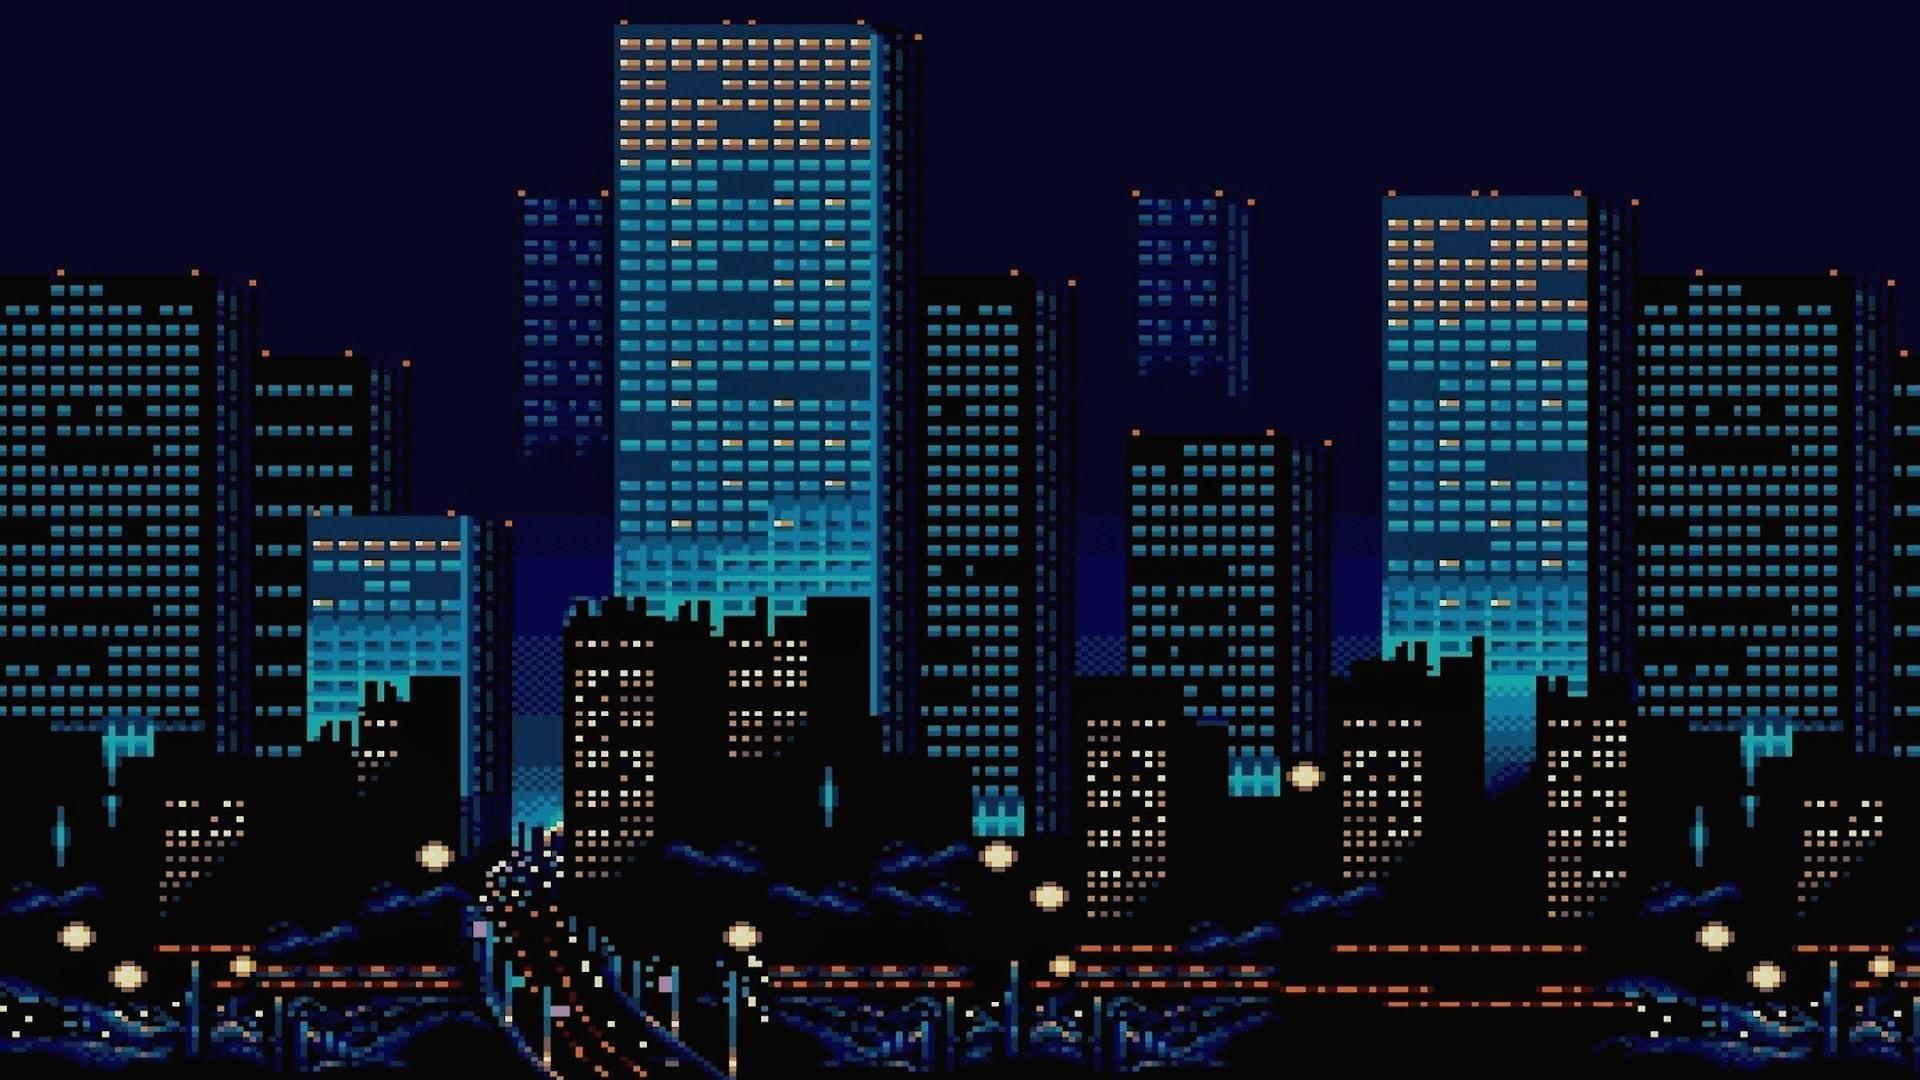 [1920x1080] 8bit City Need iPhone 6S Plus Wallpaper